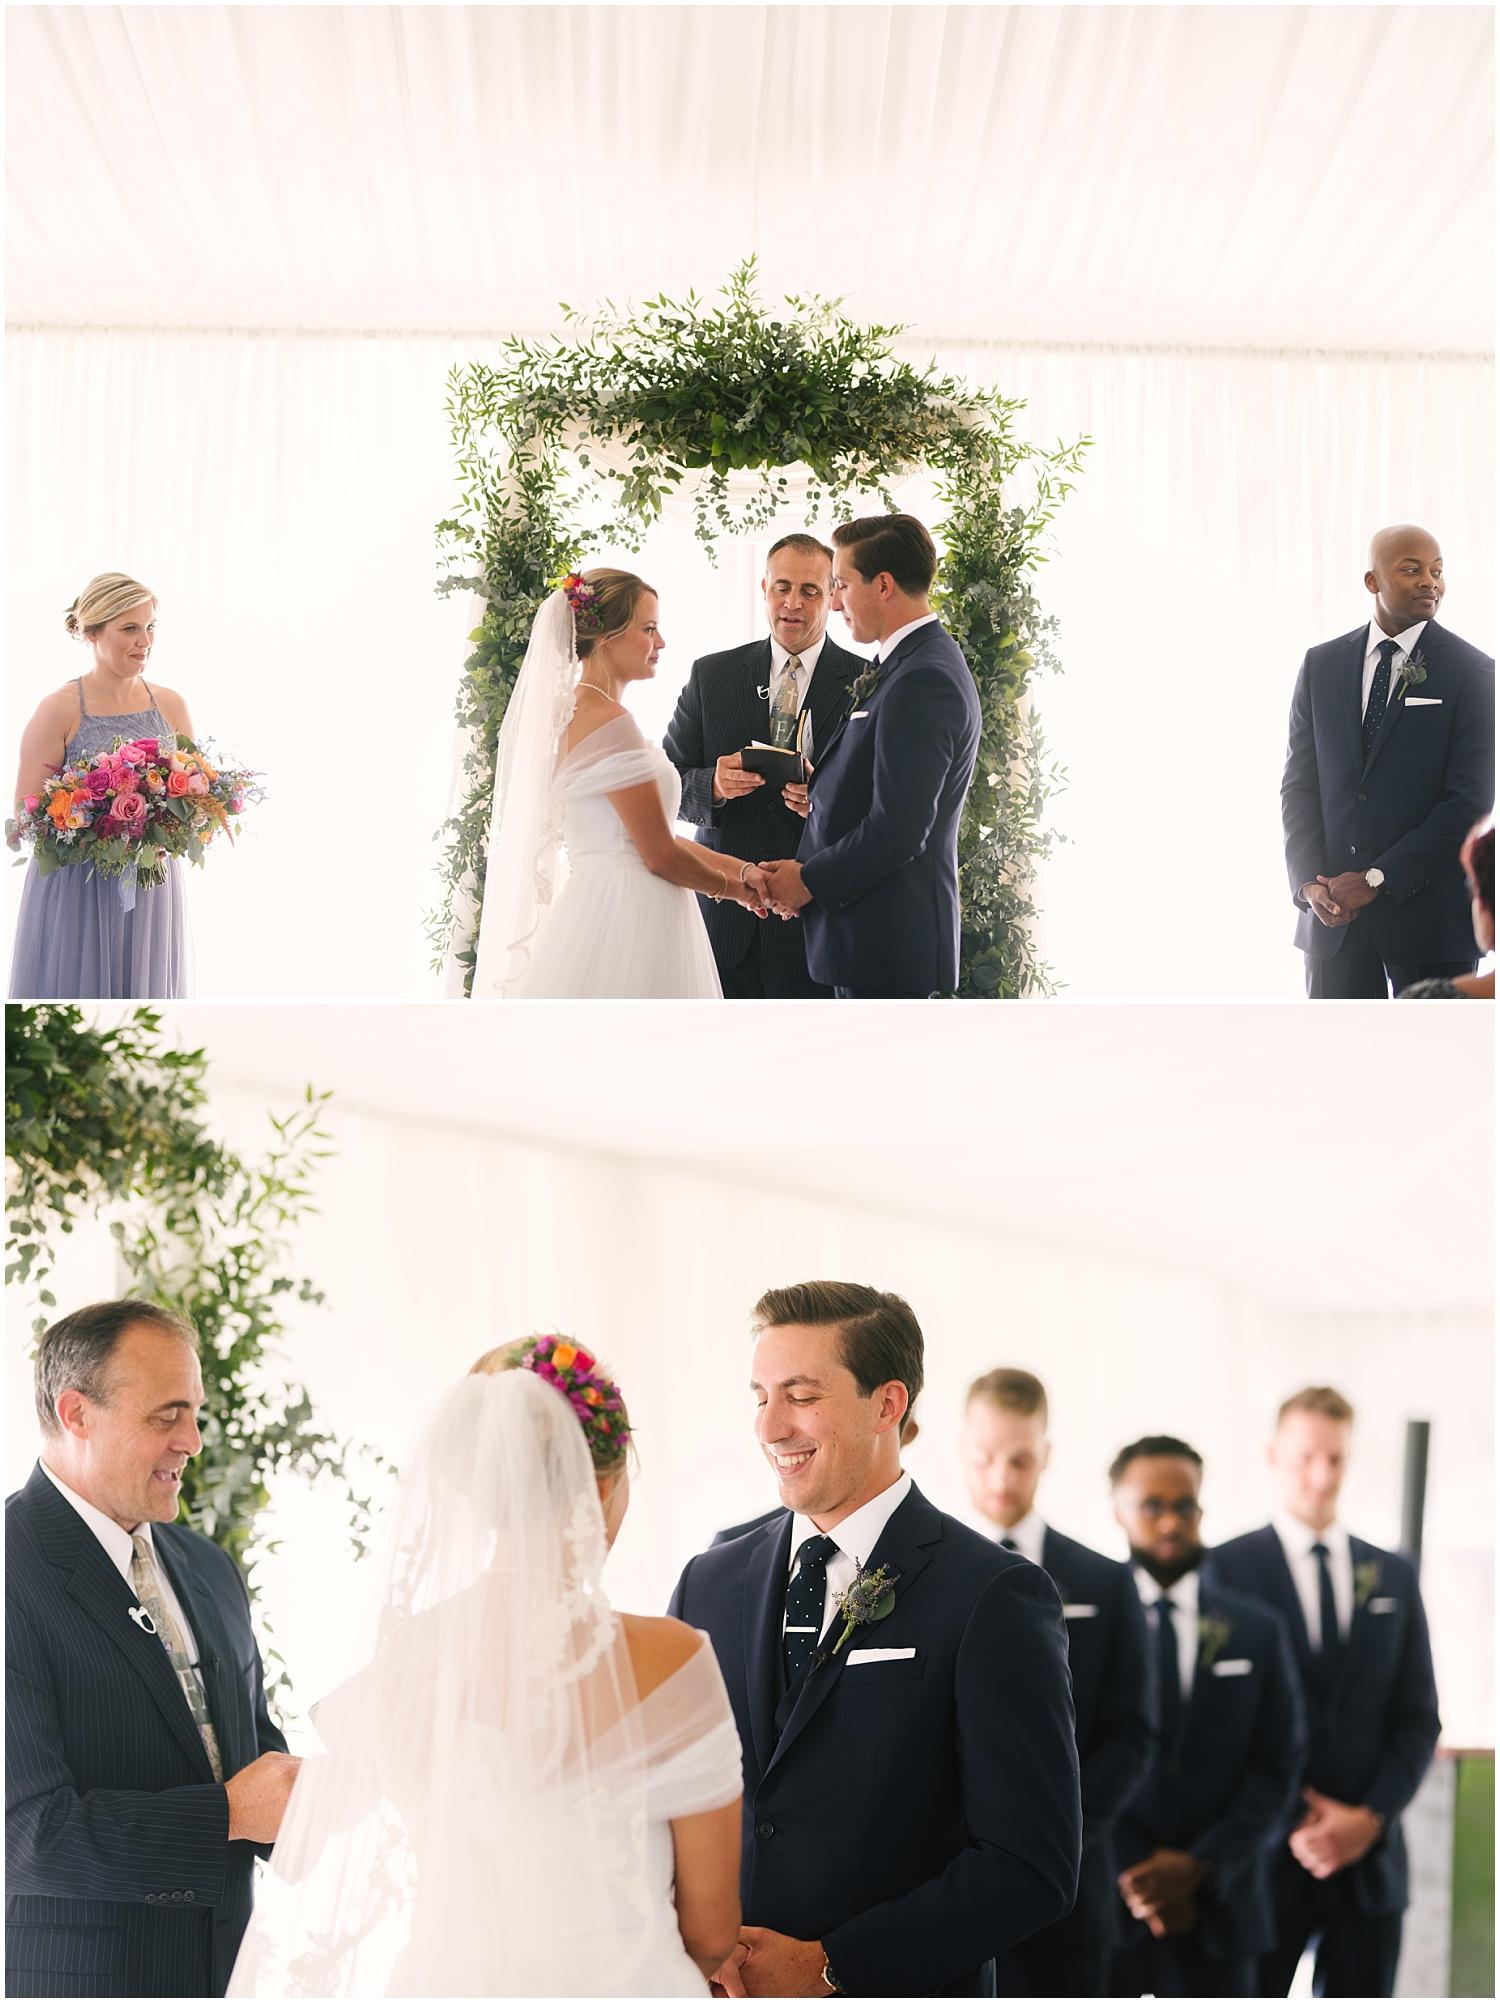 traditions+at+the+glen+wedding+binghamton+wedding (53).jpg